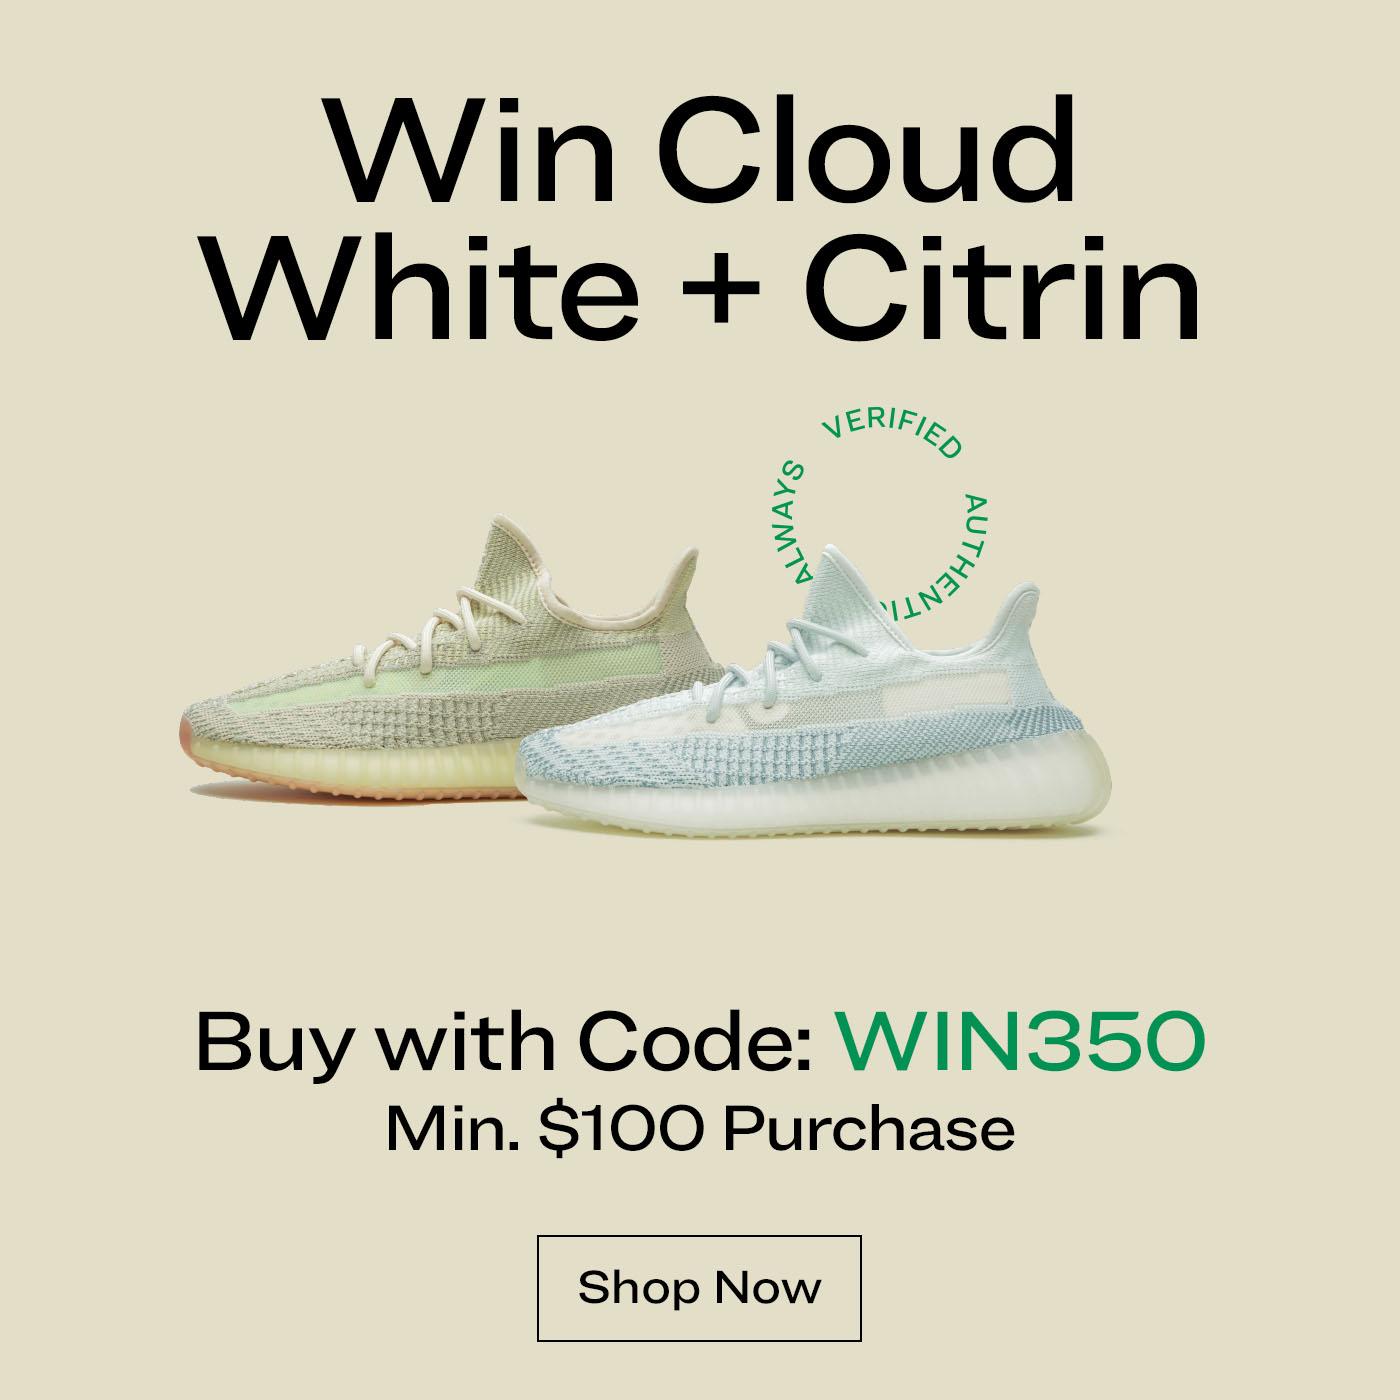 Yeezy 350 Cloud White + Citrin - StockX